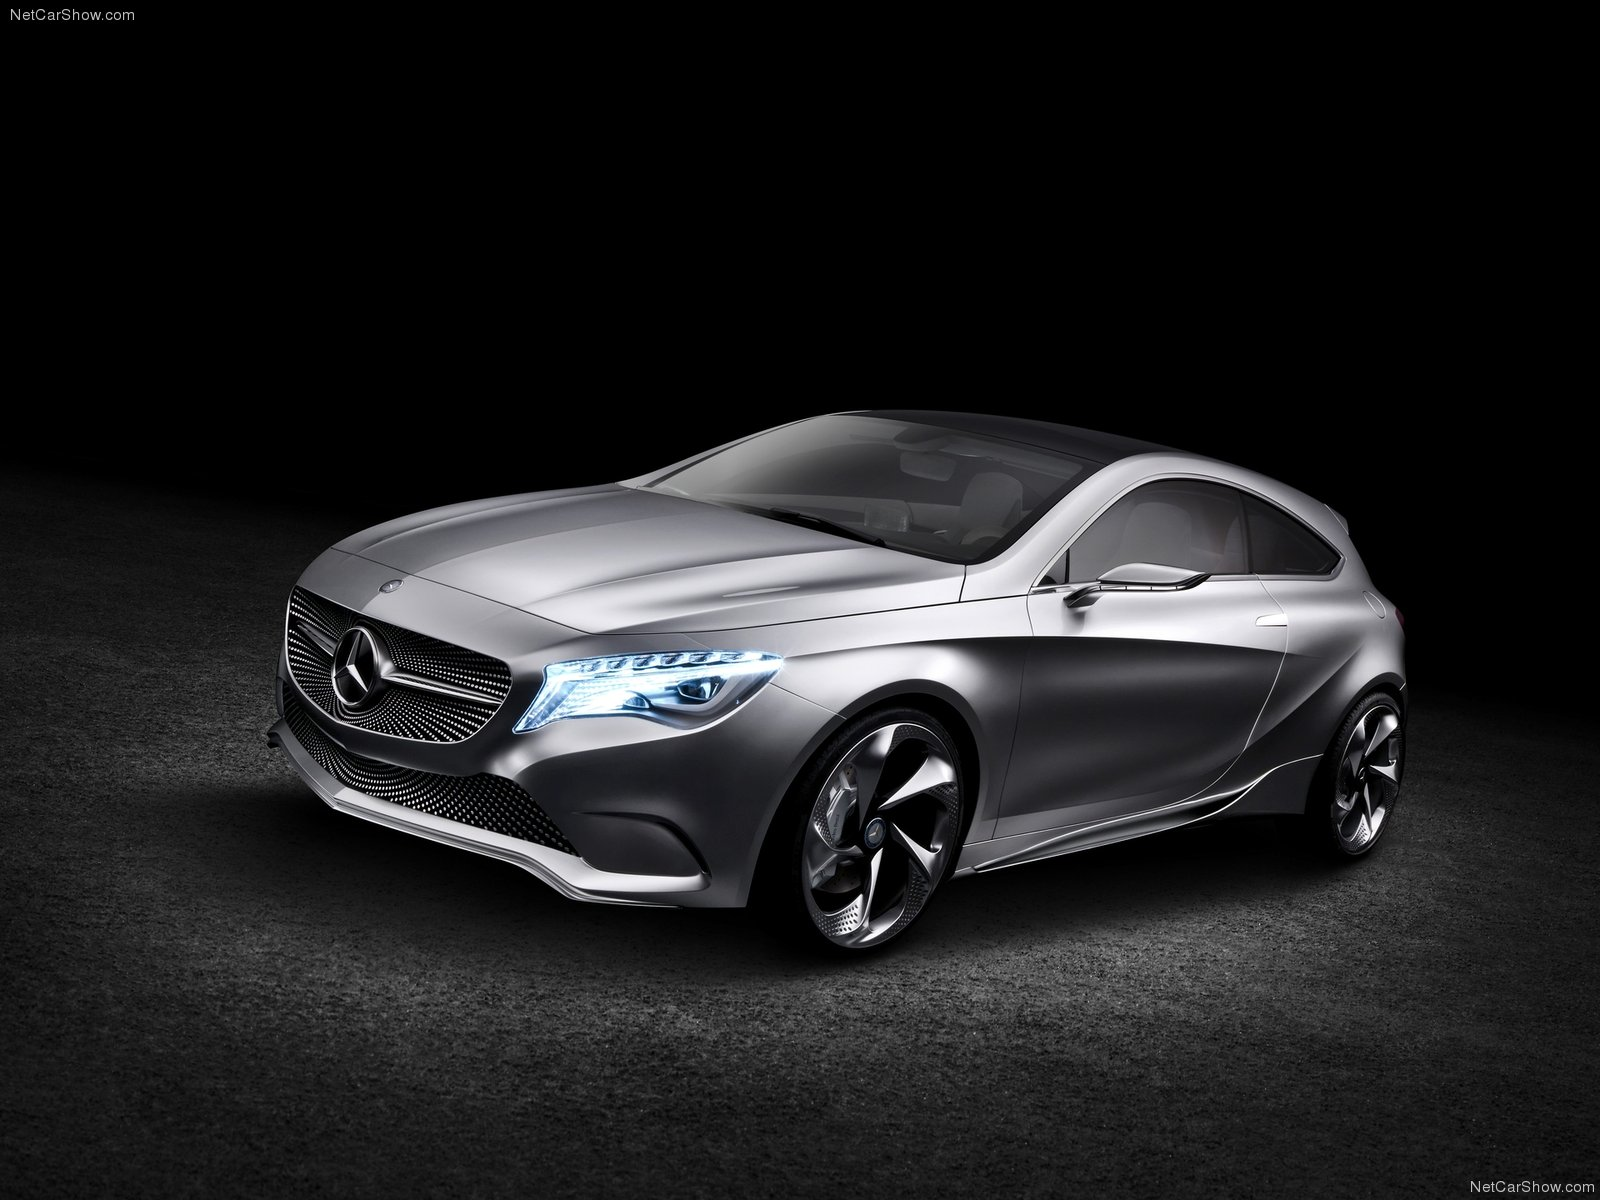 Mercedes benz a class concept picture 79986 mercedes for A class mercedes benz